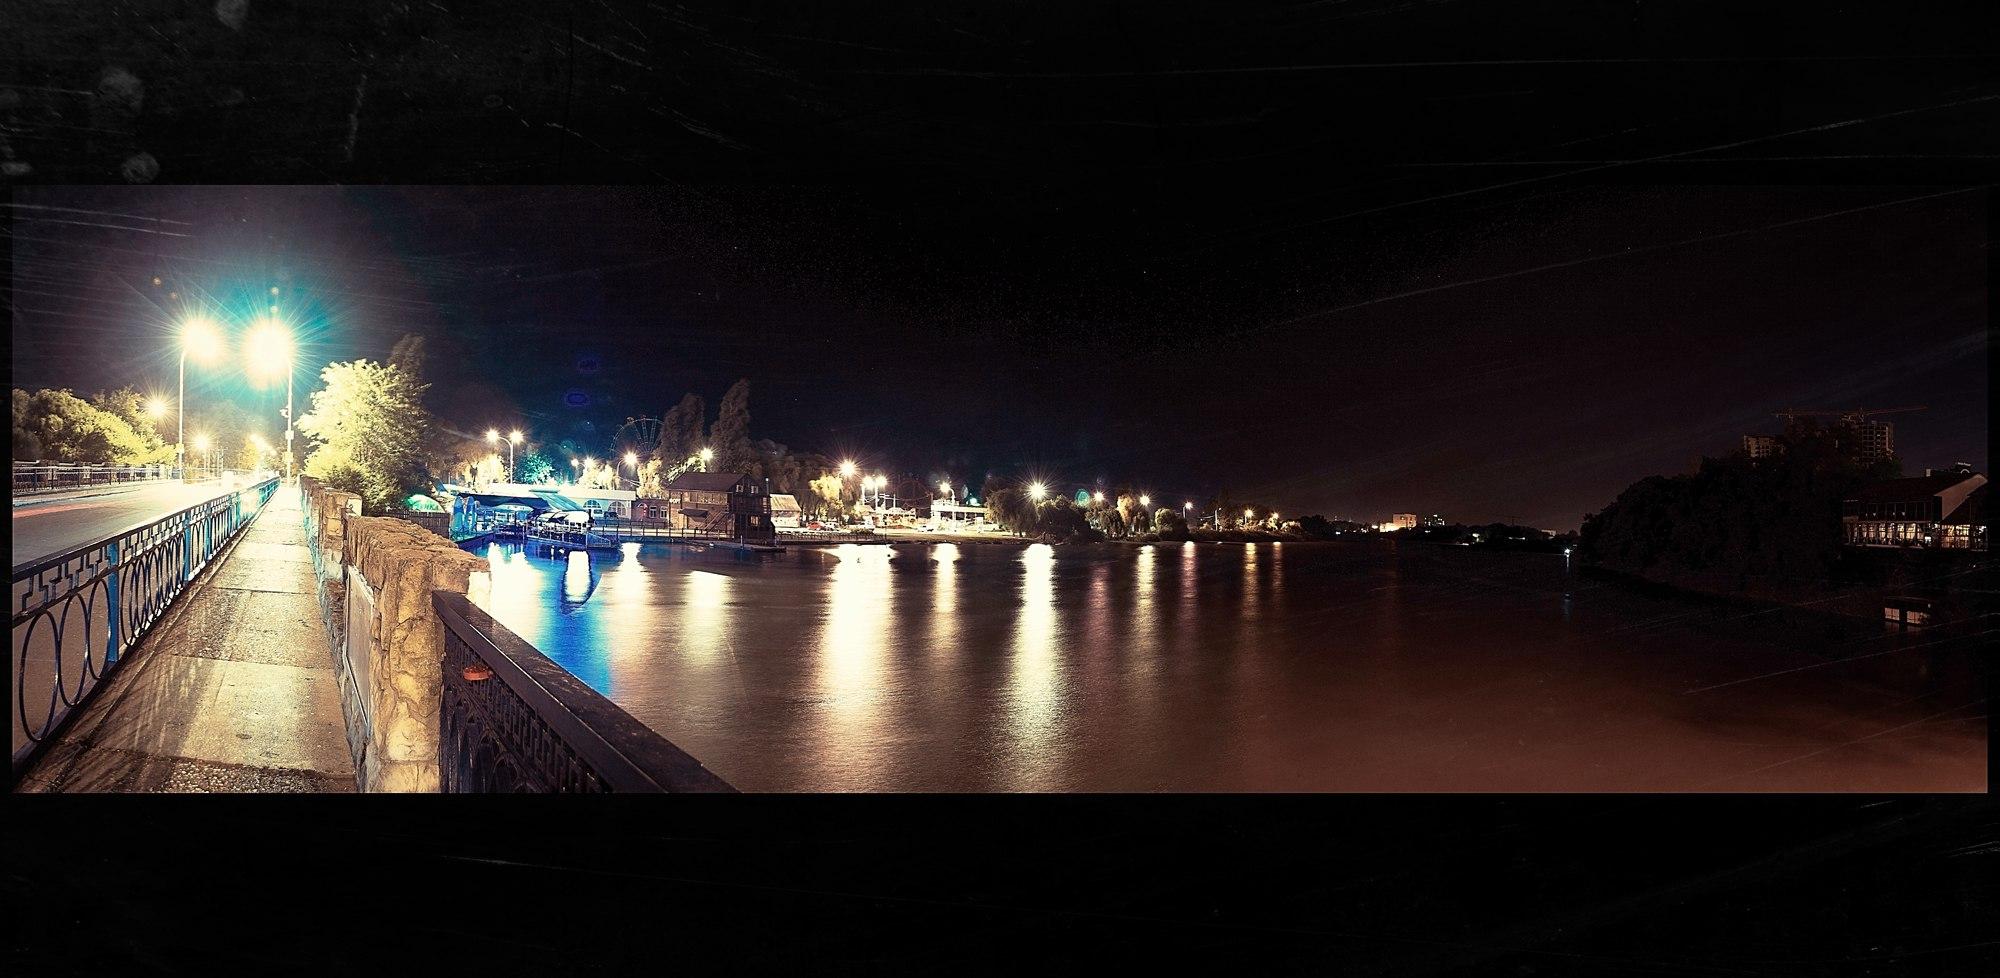 ночной краснодар фото